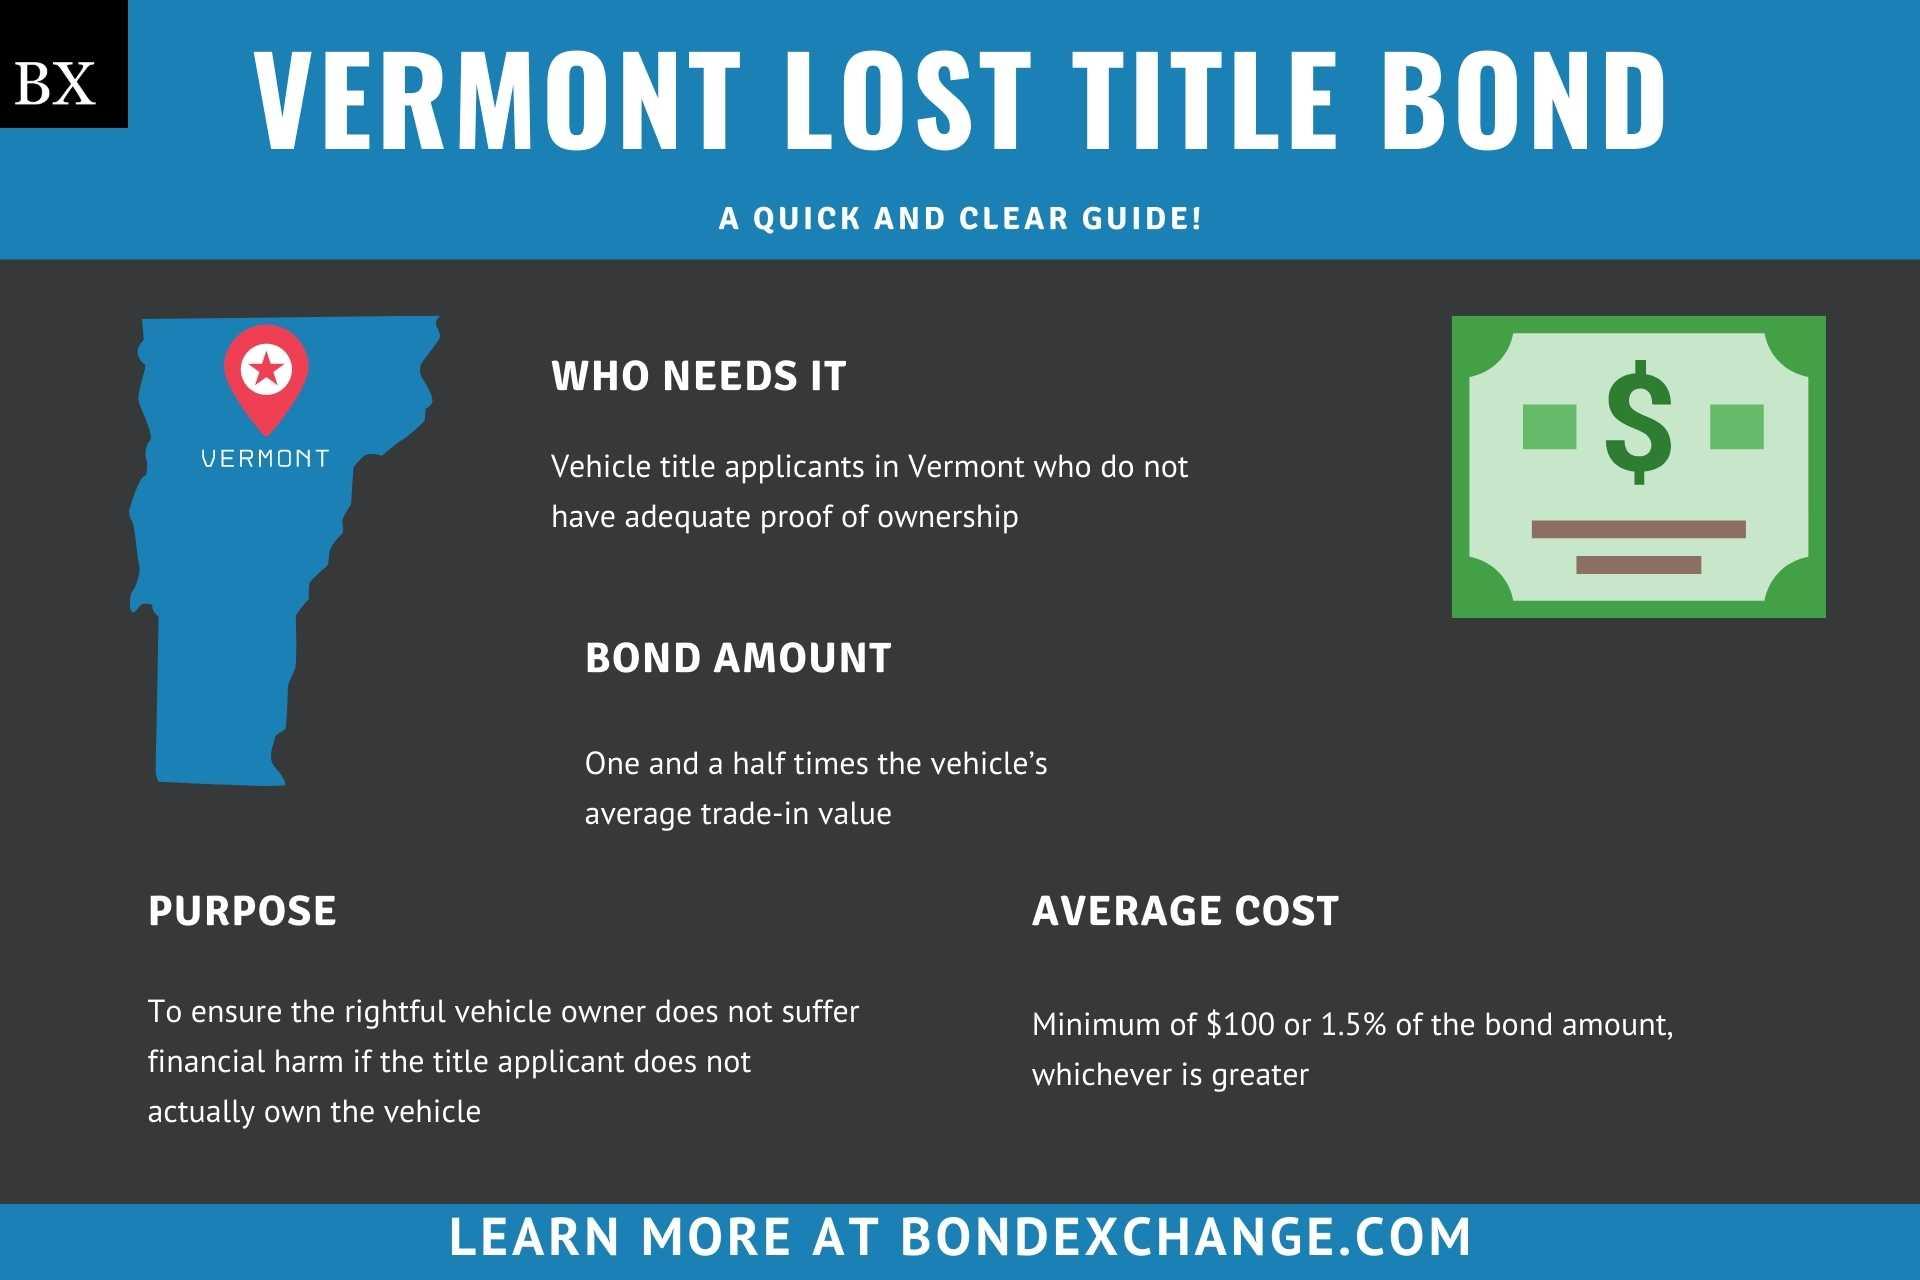 Vermont Lost Title Bond